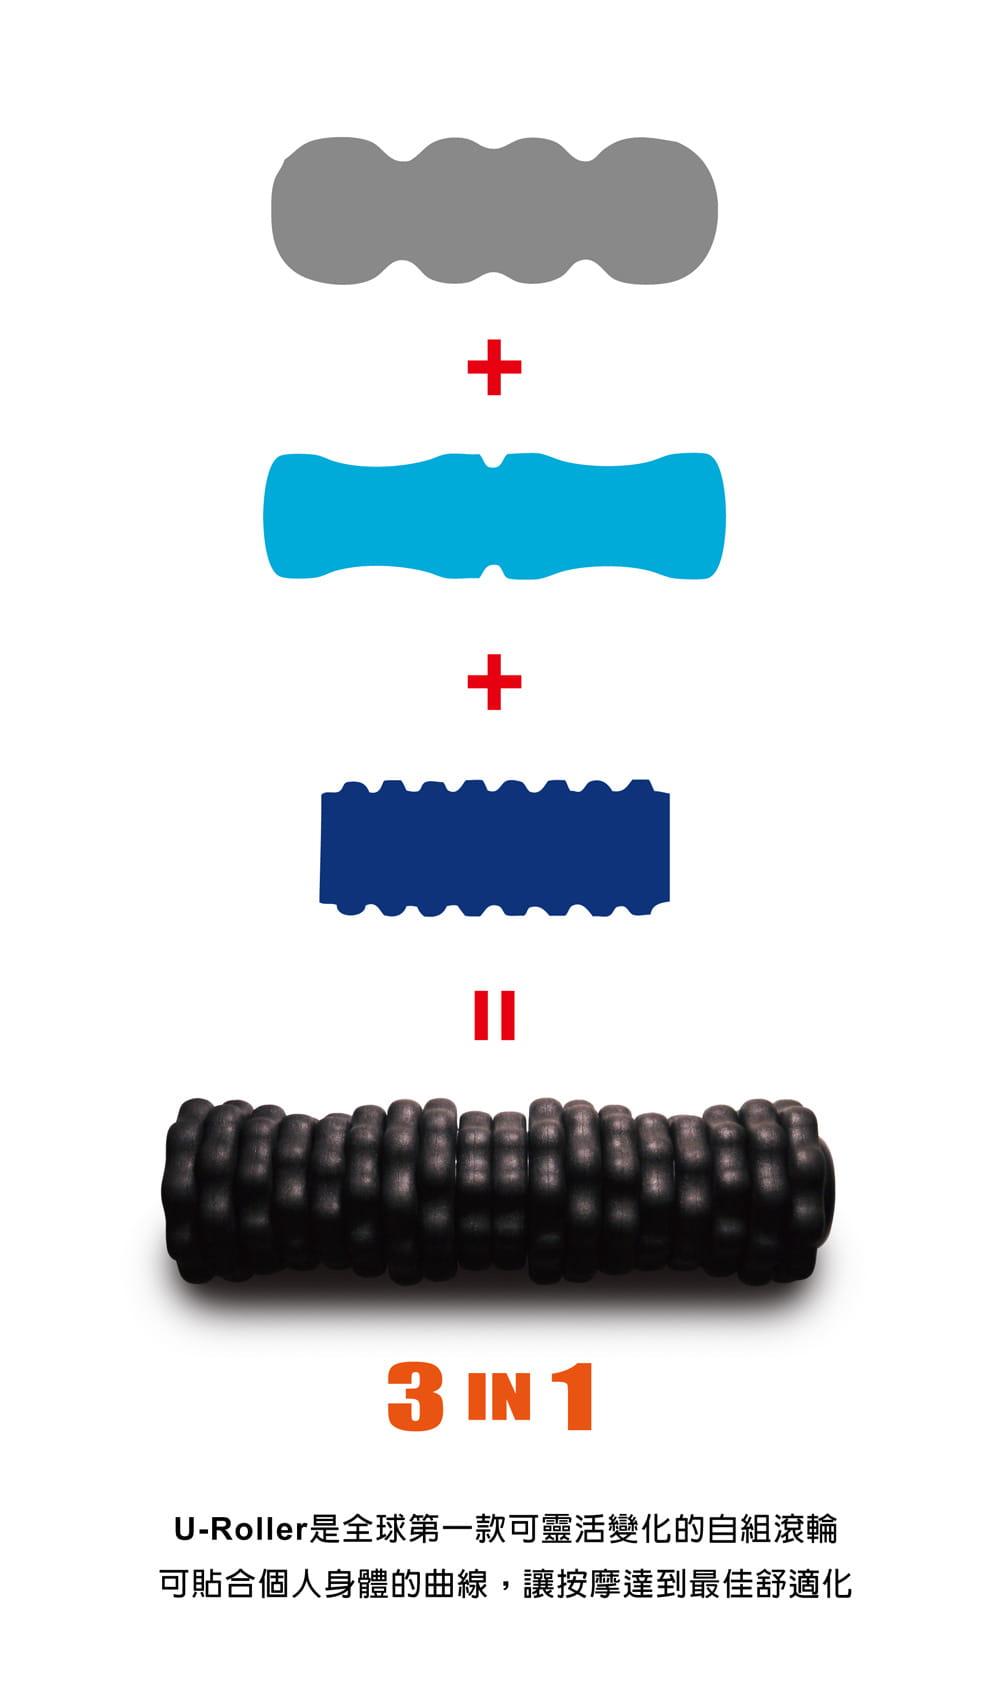 U-roller瑜伽滾輪 長版48公分【黑色硬版】 3